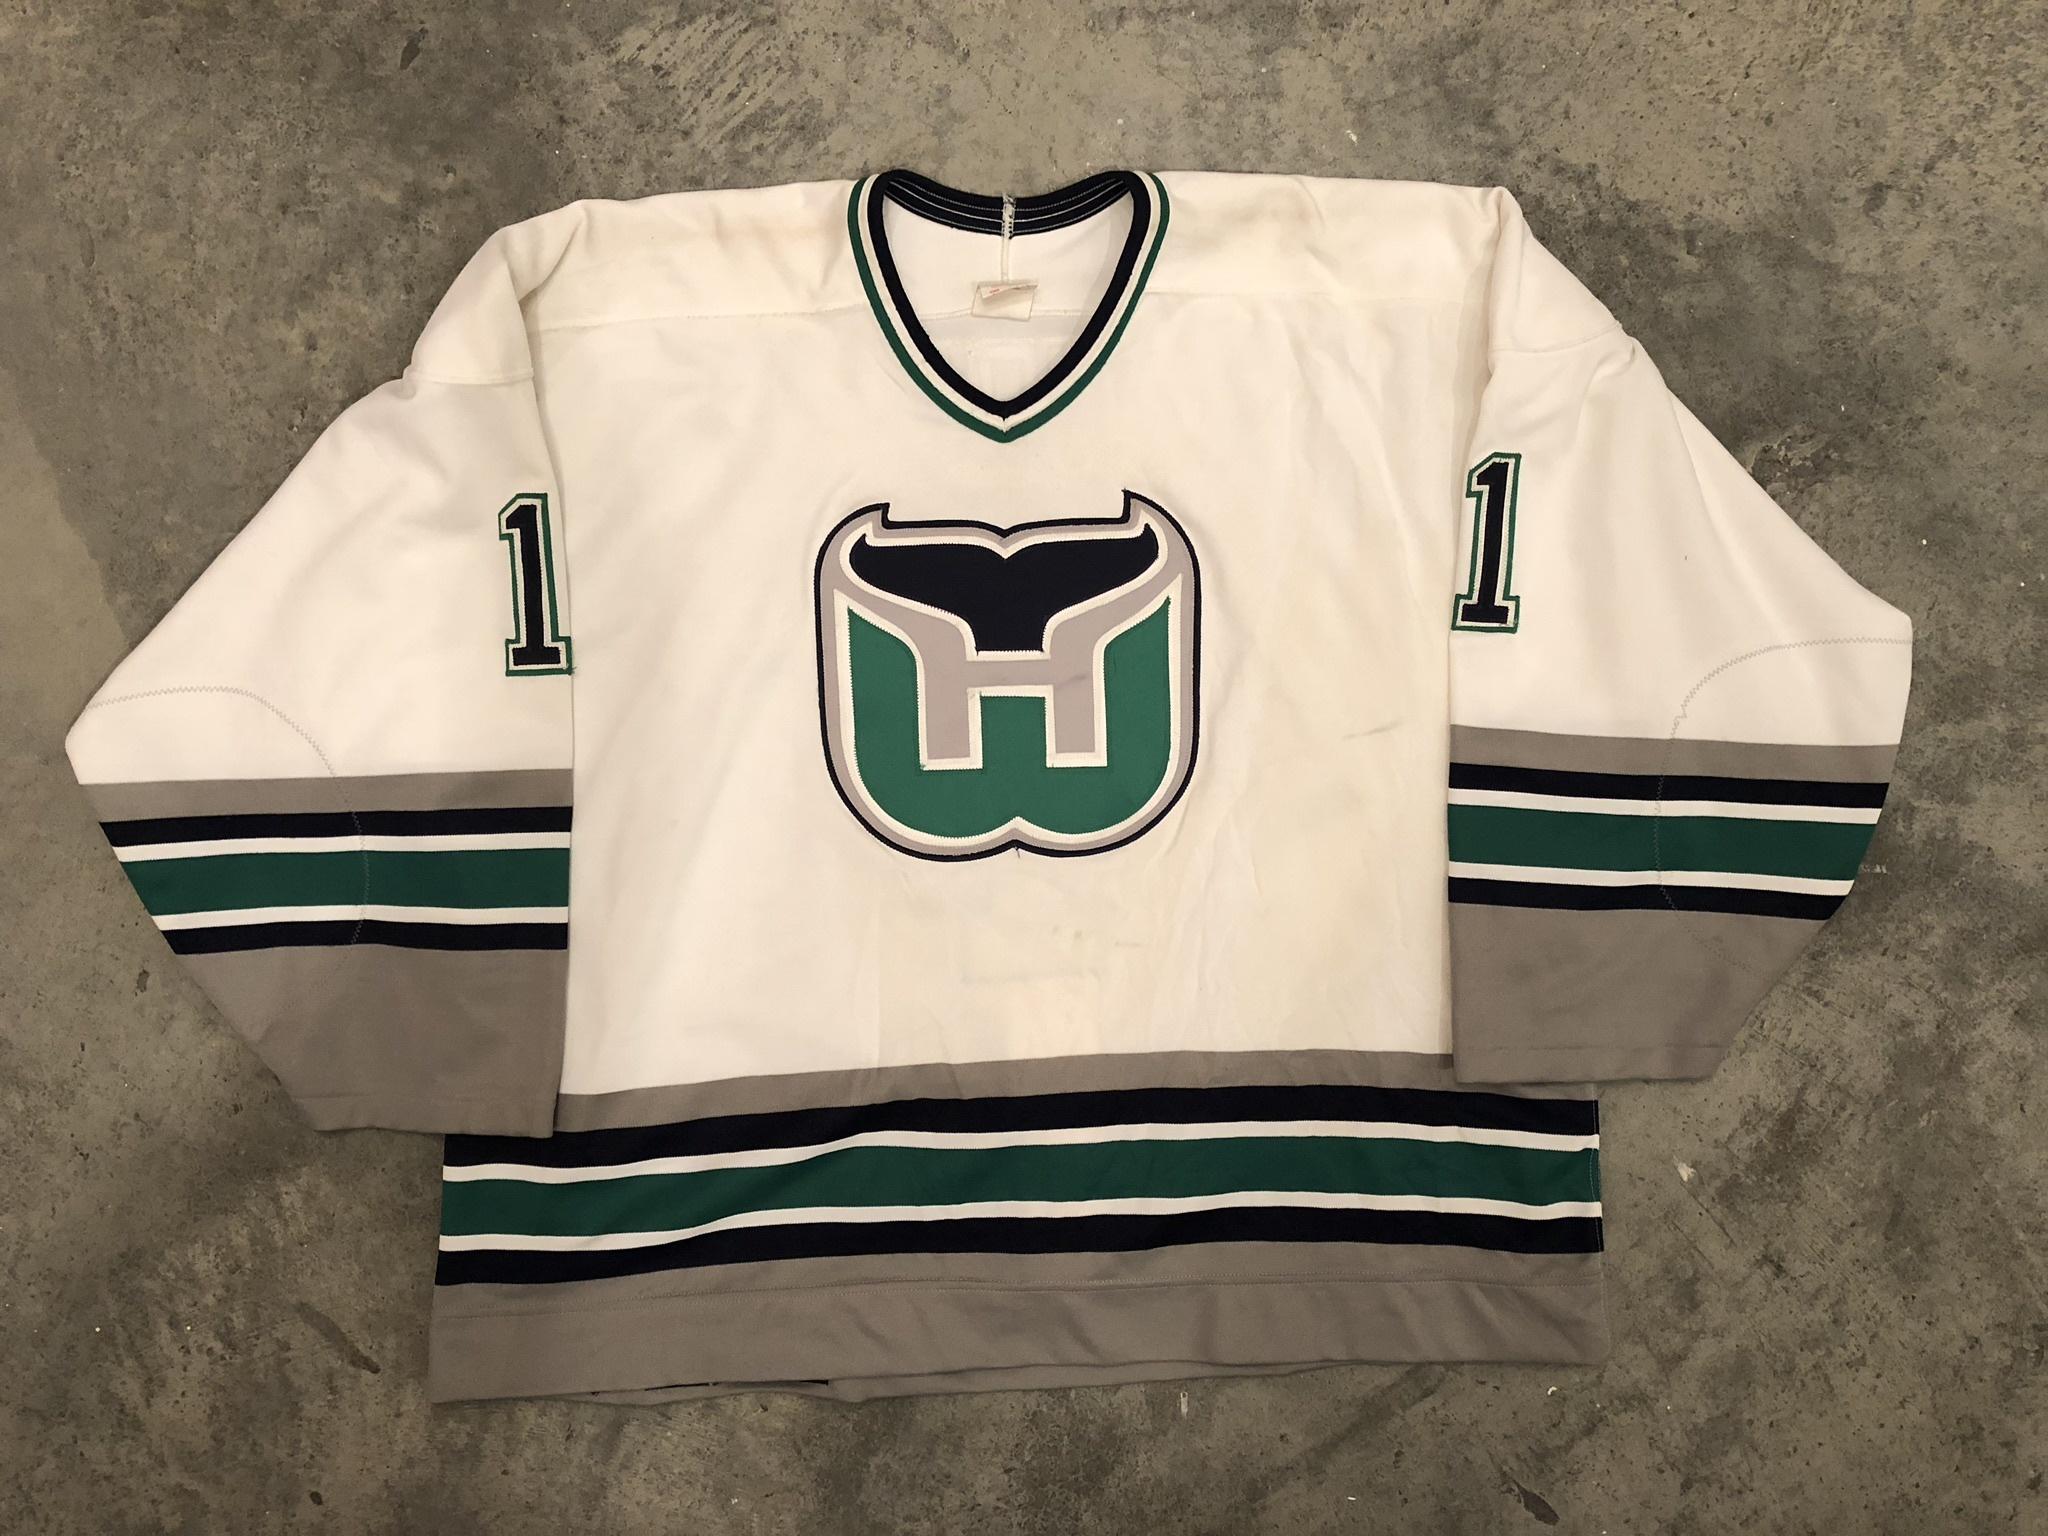 1995-96 Sean Burke Hartford Whalers home jersey